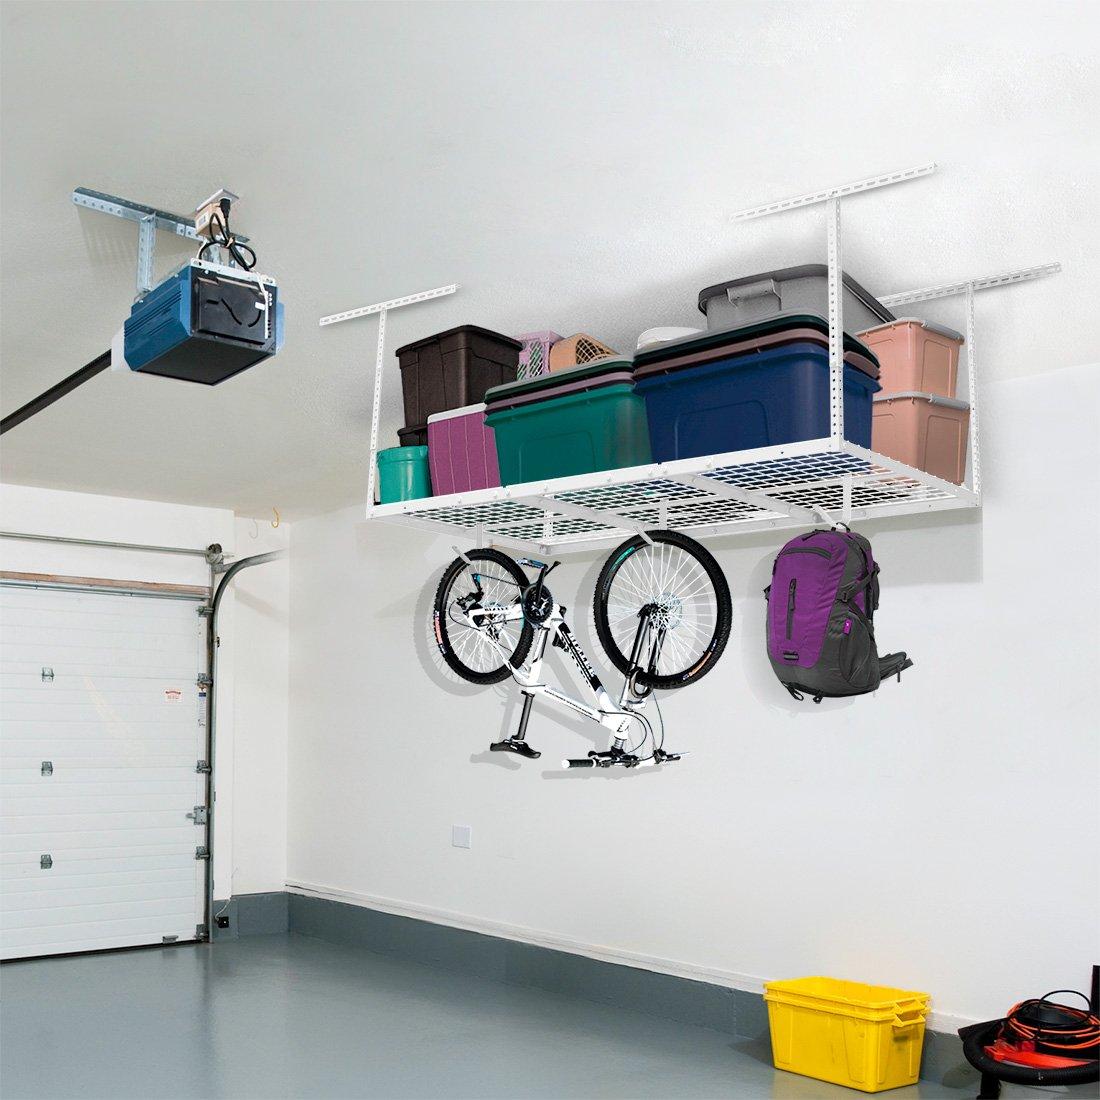 FLEXIMOUNTS 3x6 Overhead Garage Storage Adjustable Ceiling Storage Rack, 72'' Length x 36'' Width x 40'' Height (white)